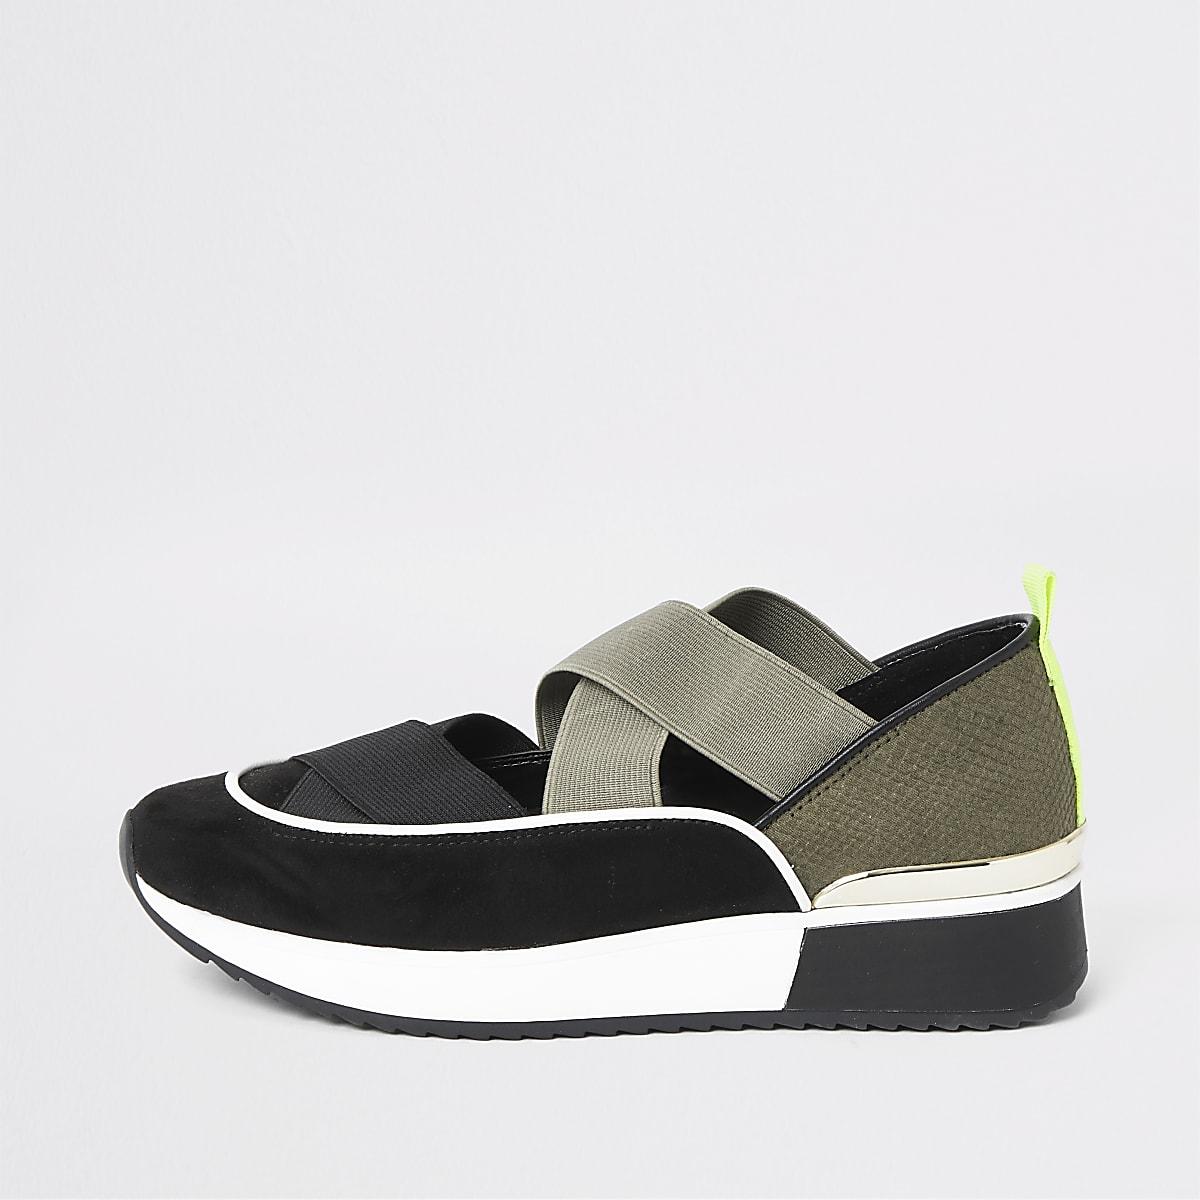 Zwarte sneakers met uitsnede